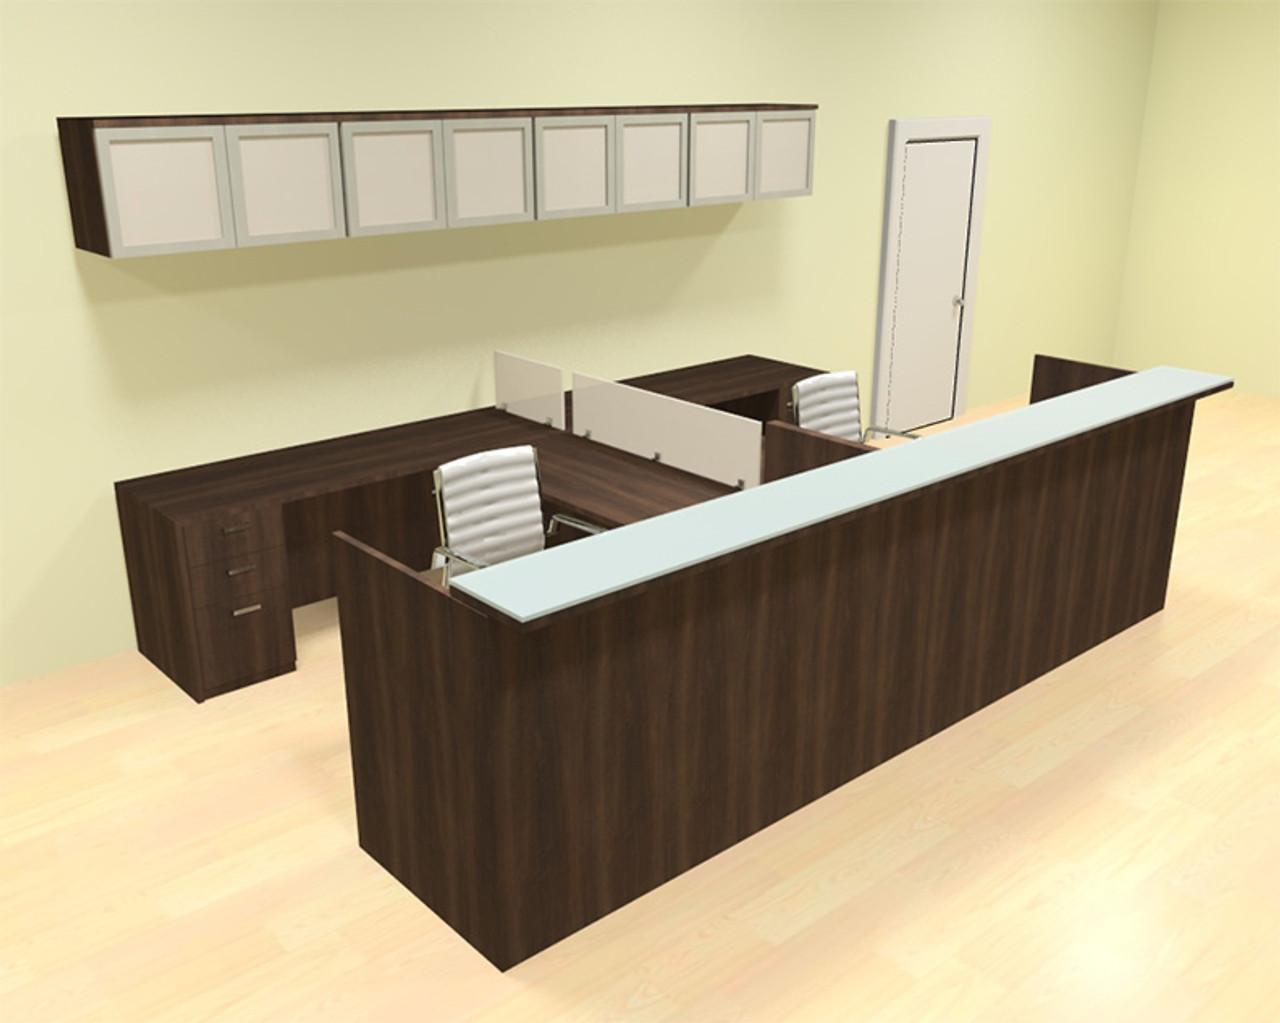 12pc 12' Feet U Shaped Glass Counter Reception Desk Set, #CH-AMB-R24